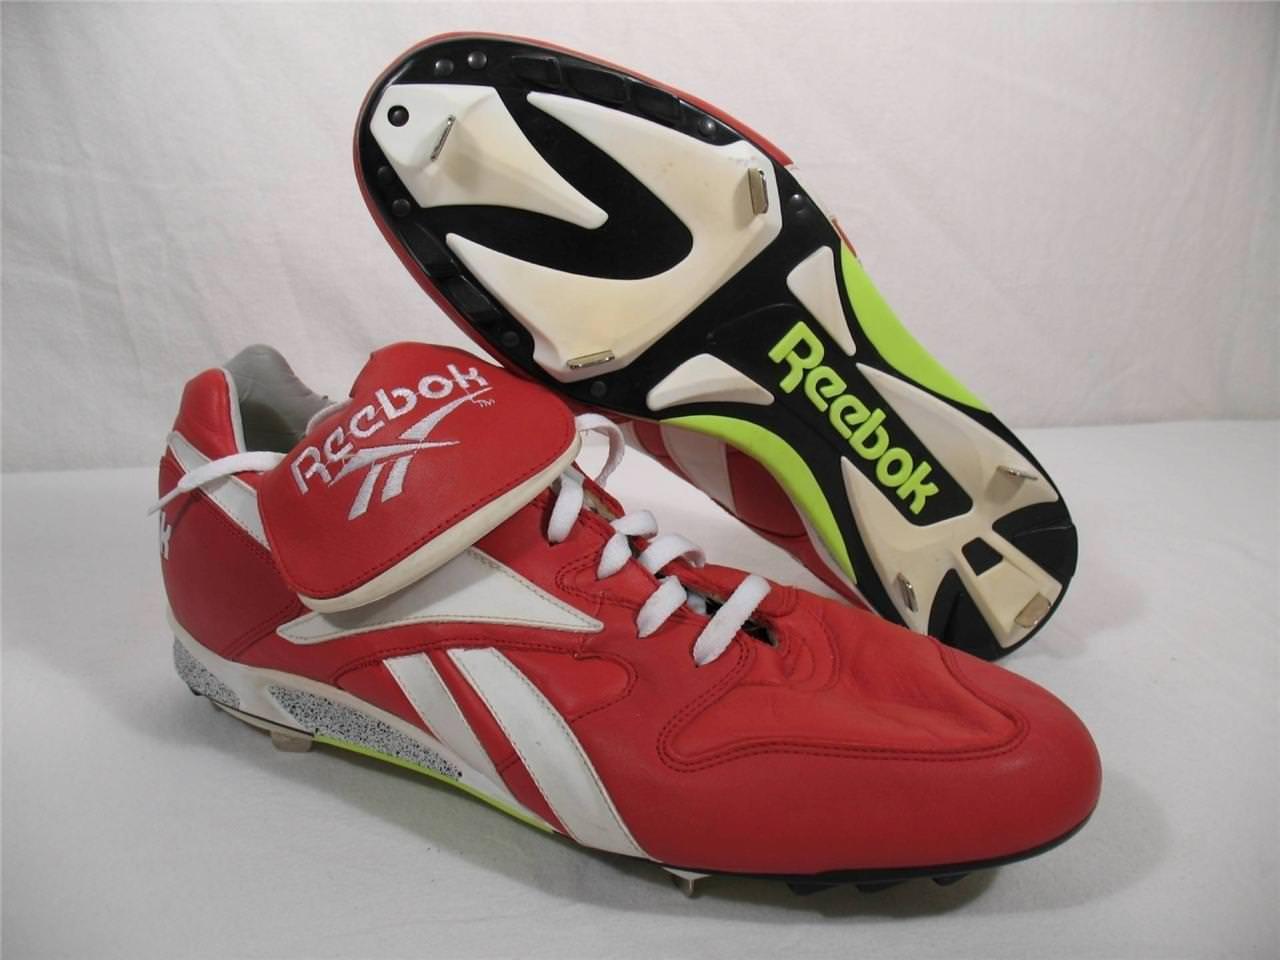 Reebok Leather Baseball Shoes Softball Metal Cleats Spikes Shoes Baseball Red White Mens 16 e2d993